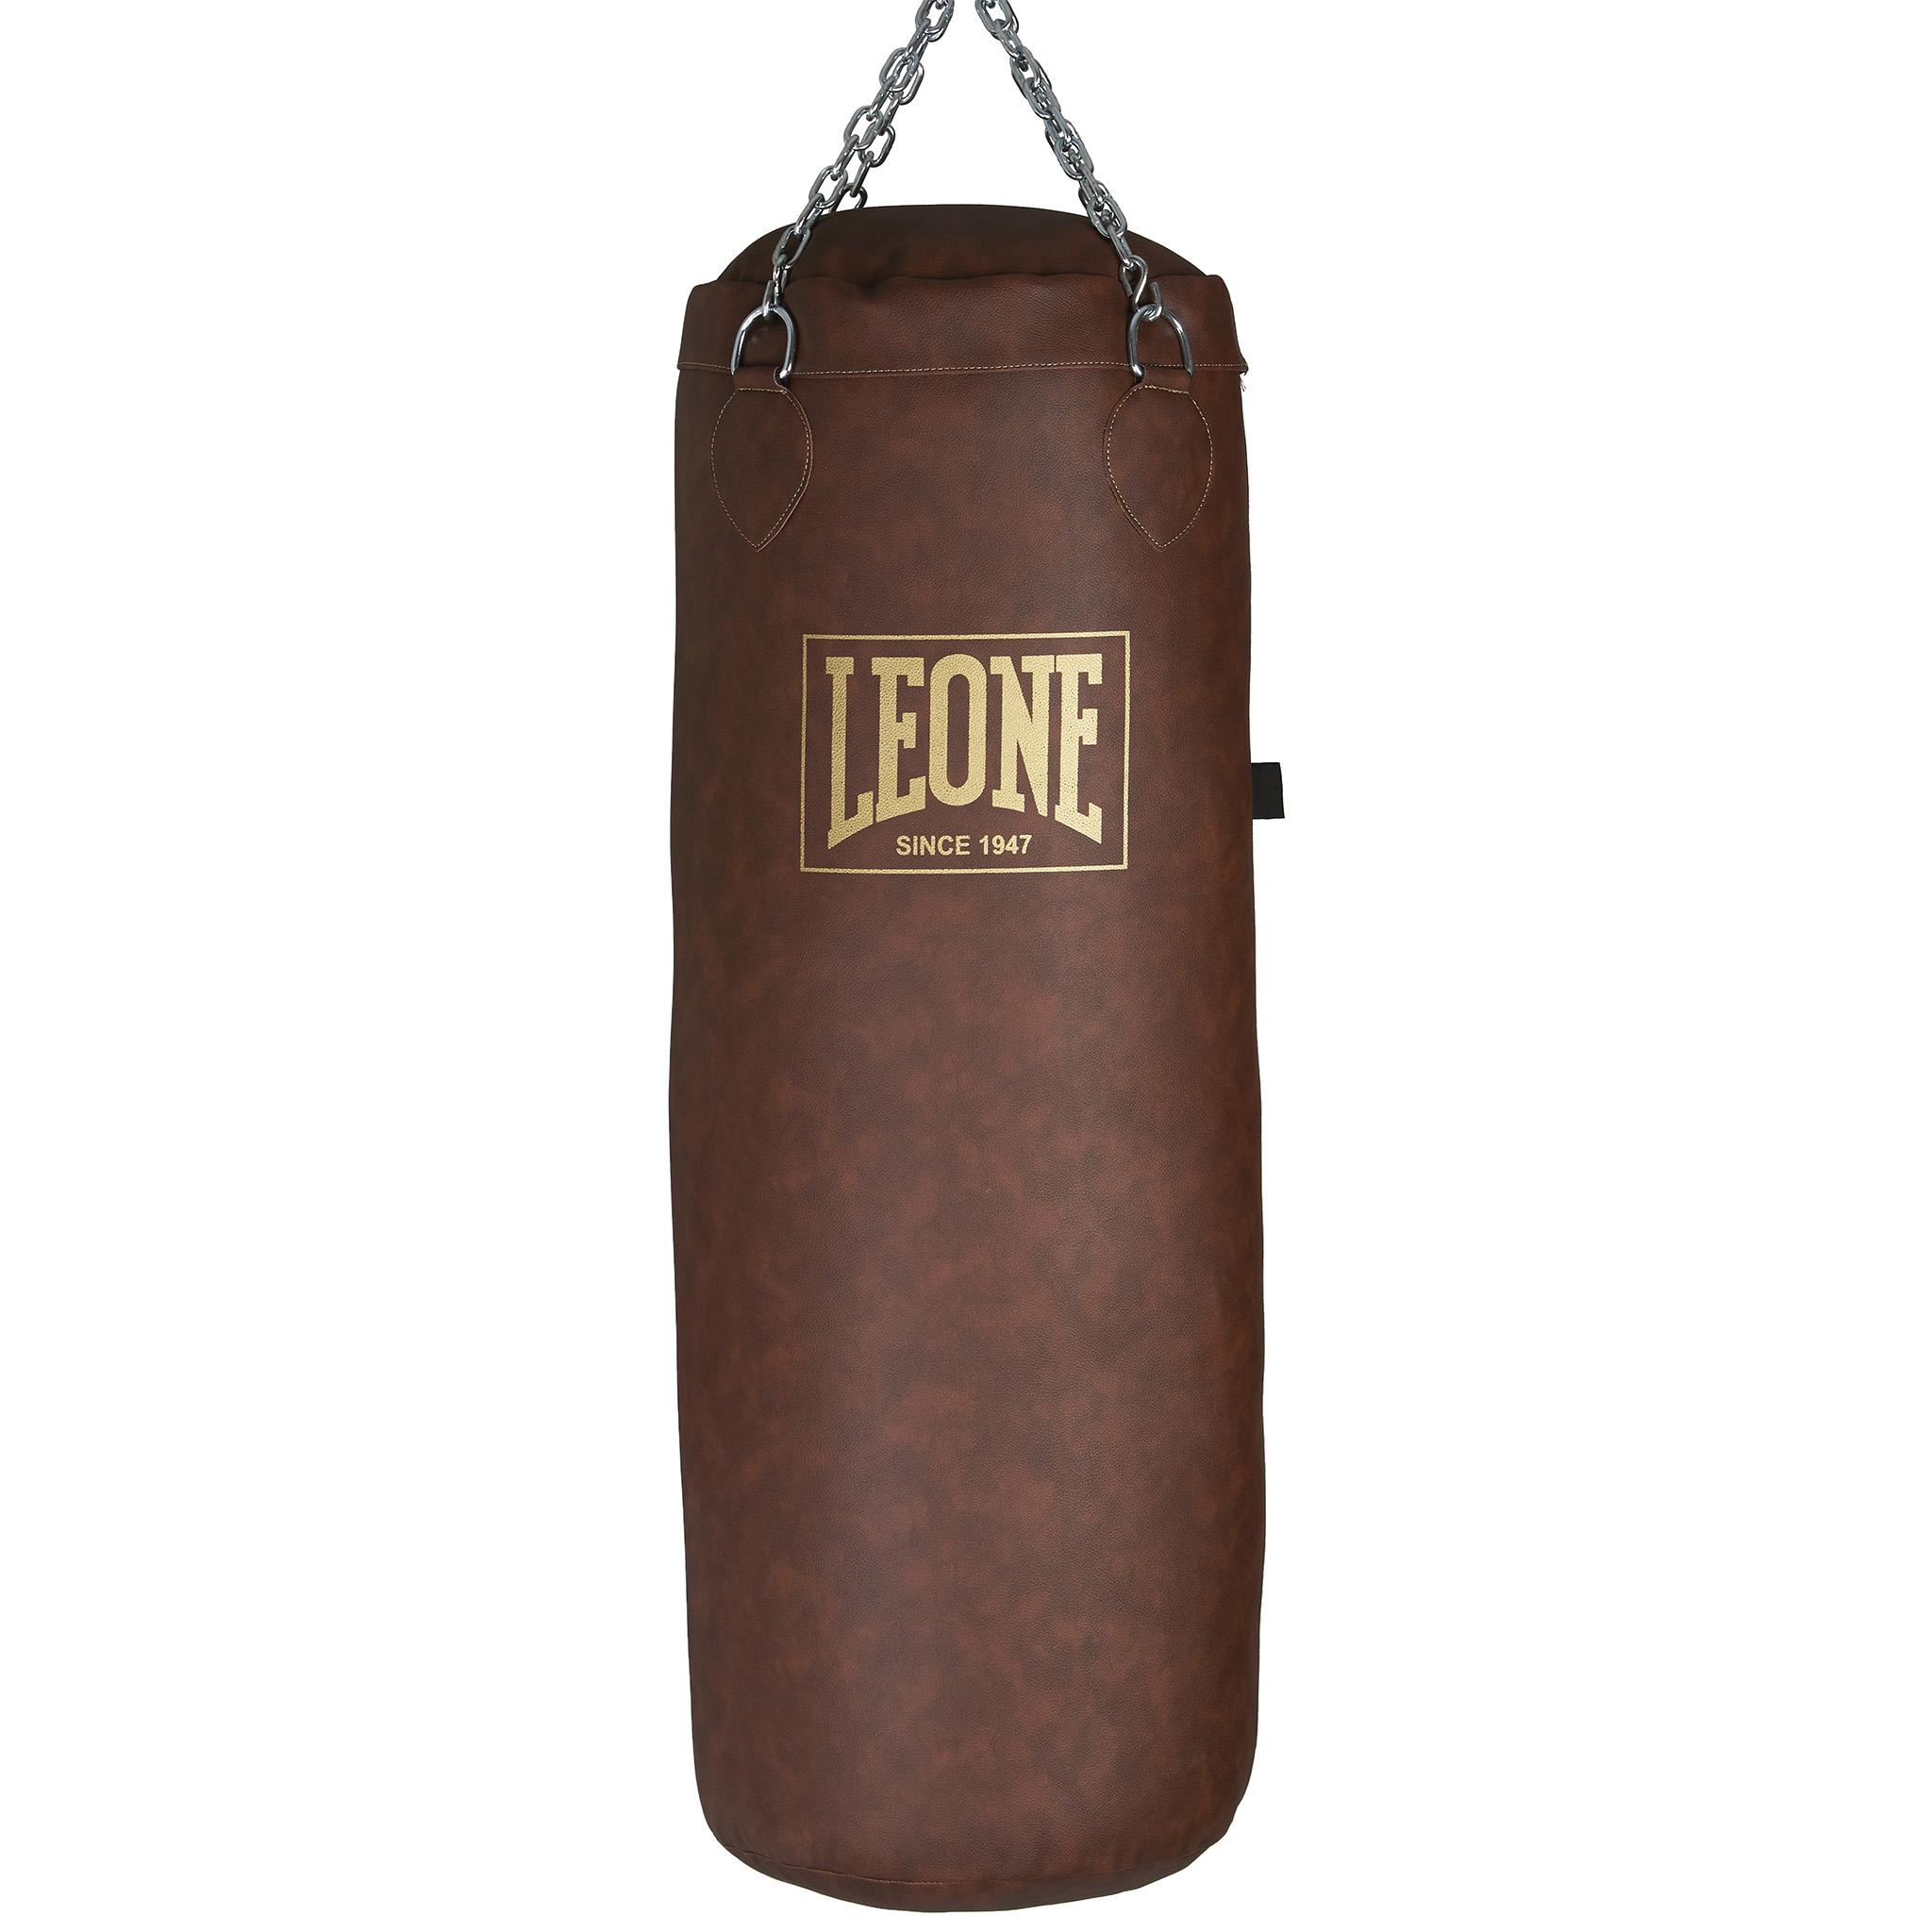 Sac de frappe Leone Vintage